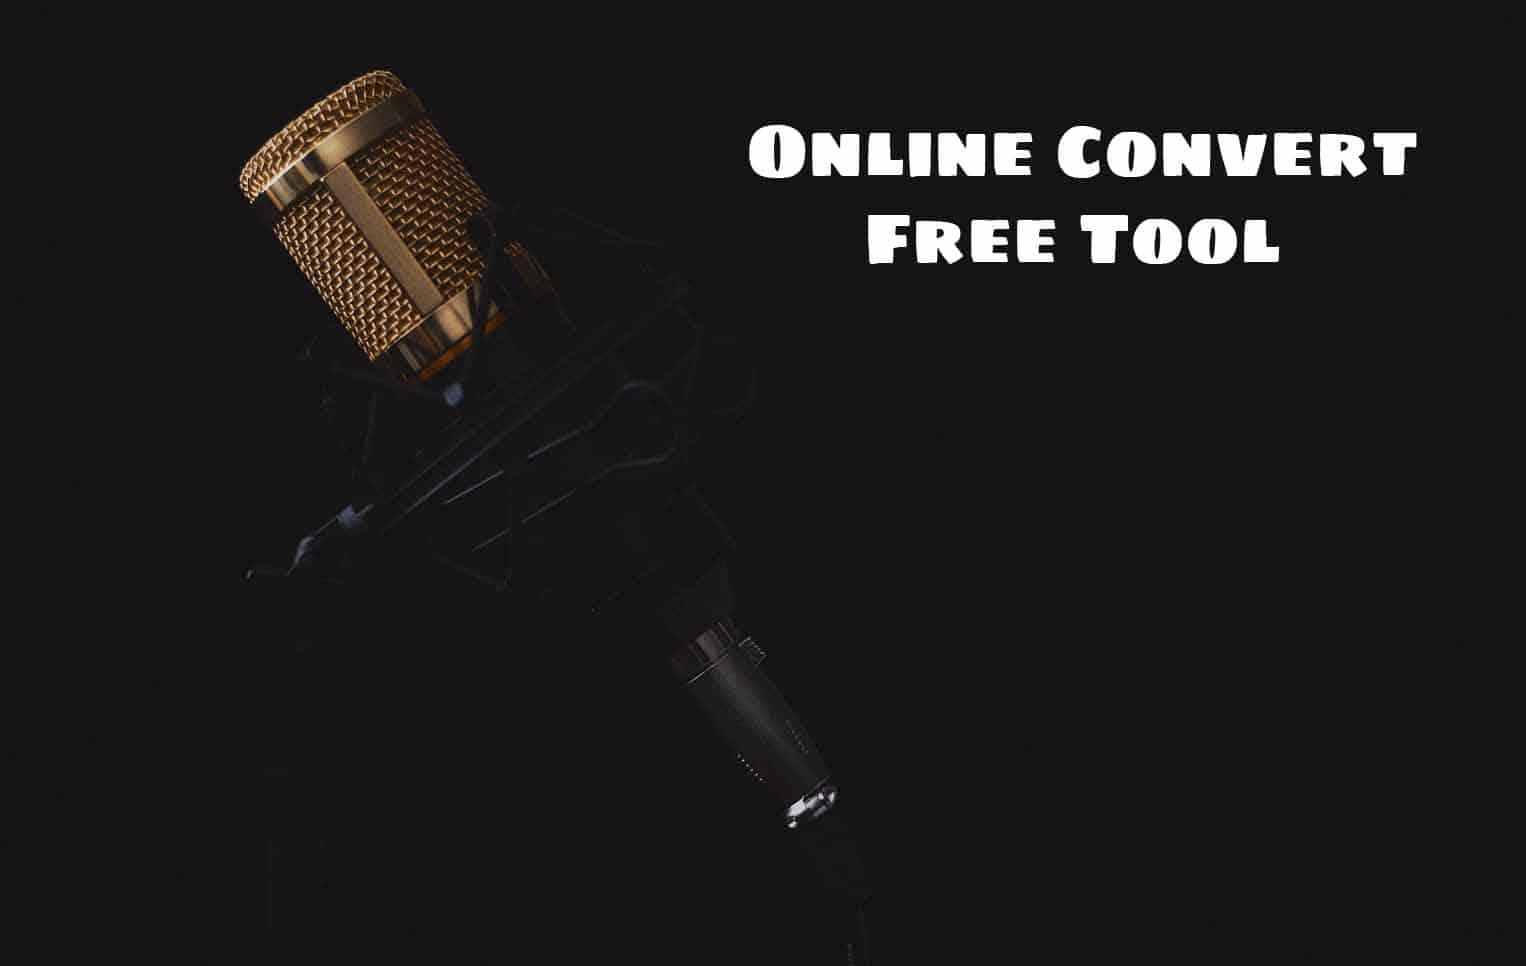 Online Convert Free Tool